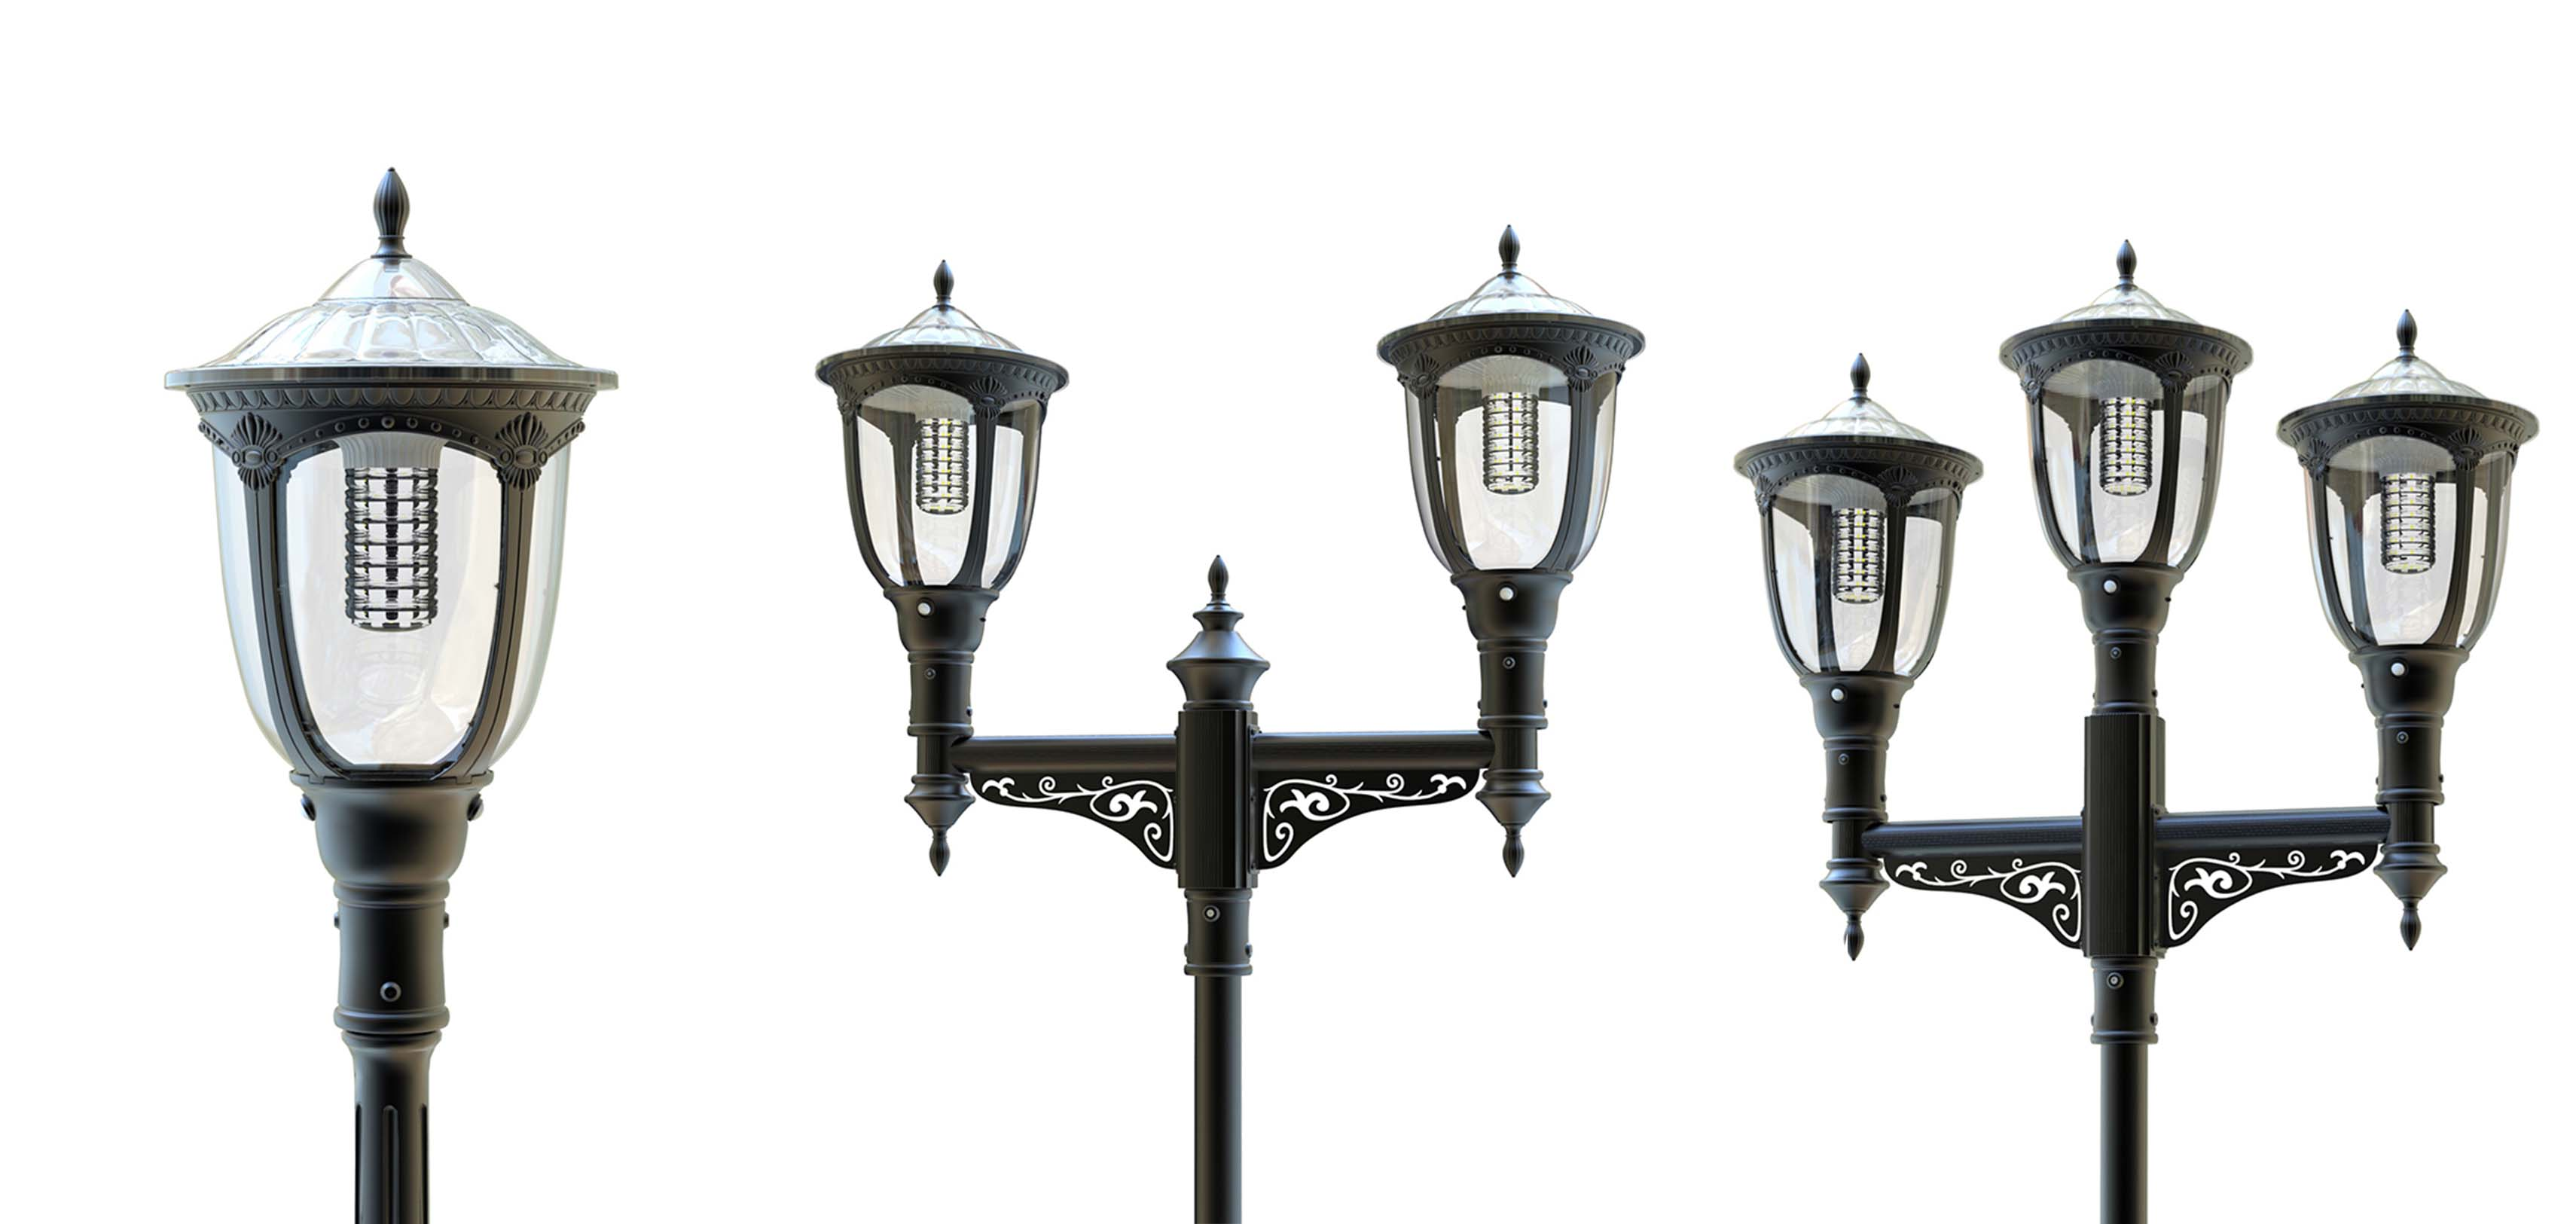 solarna lampa czteroramienna